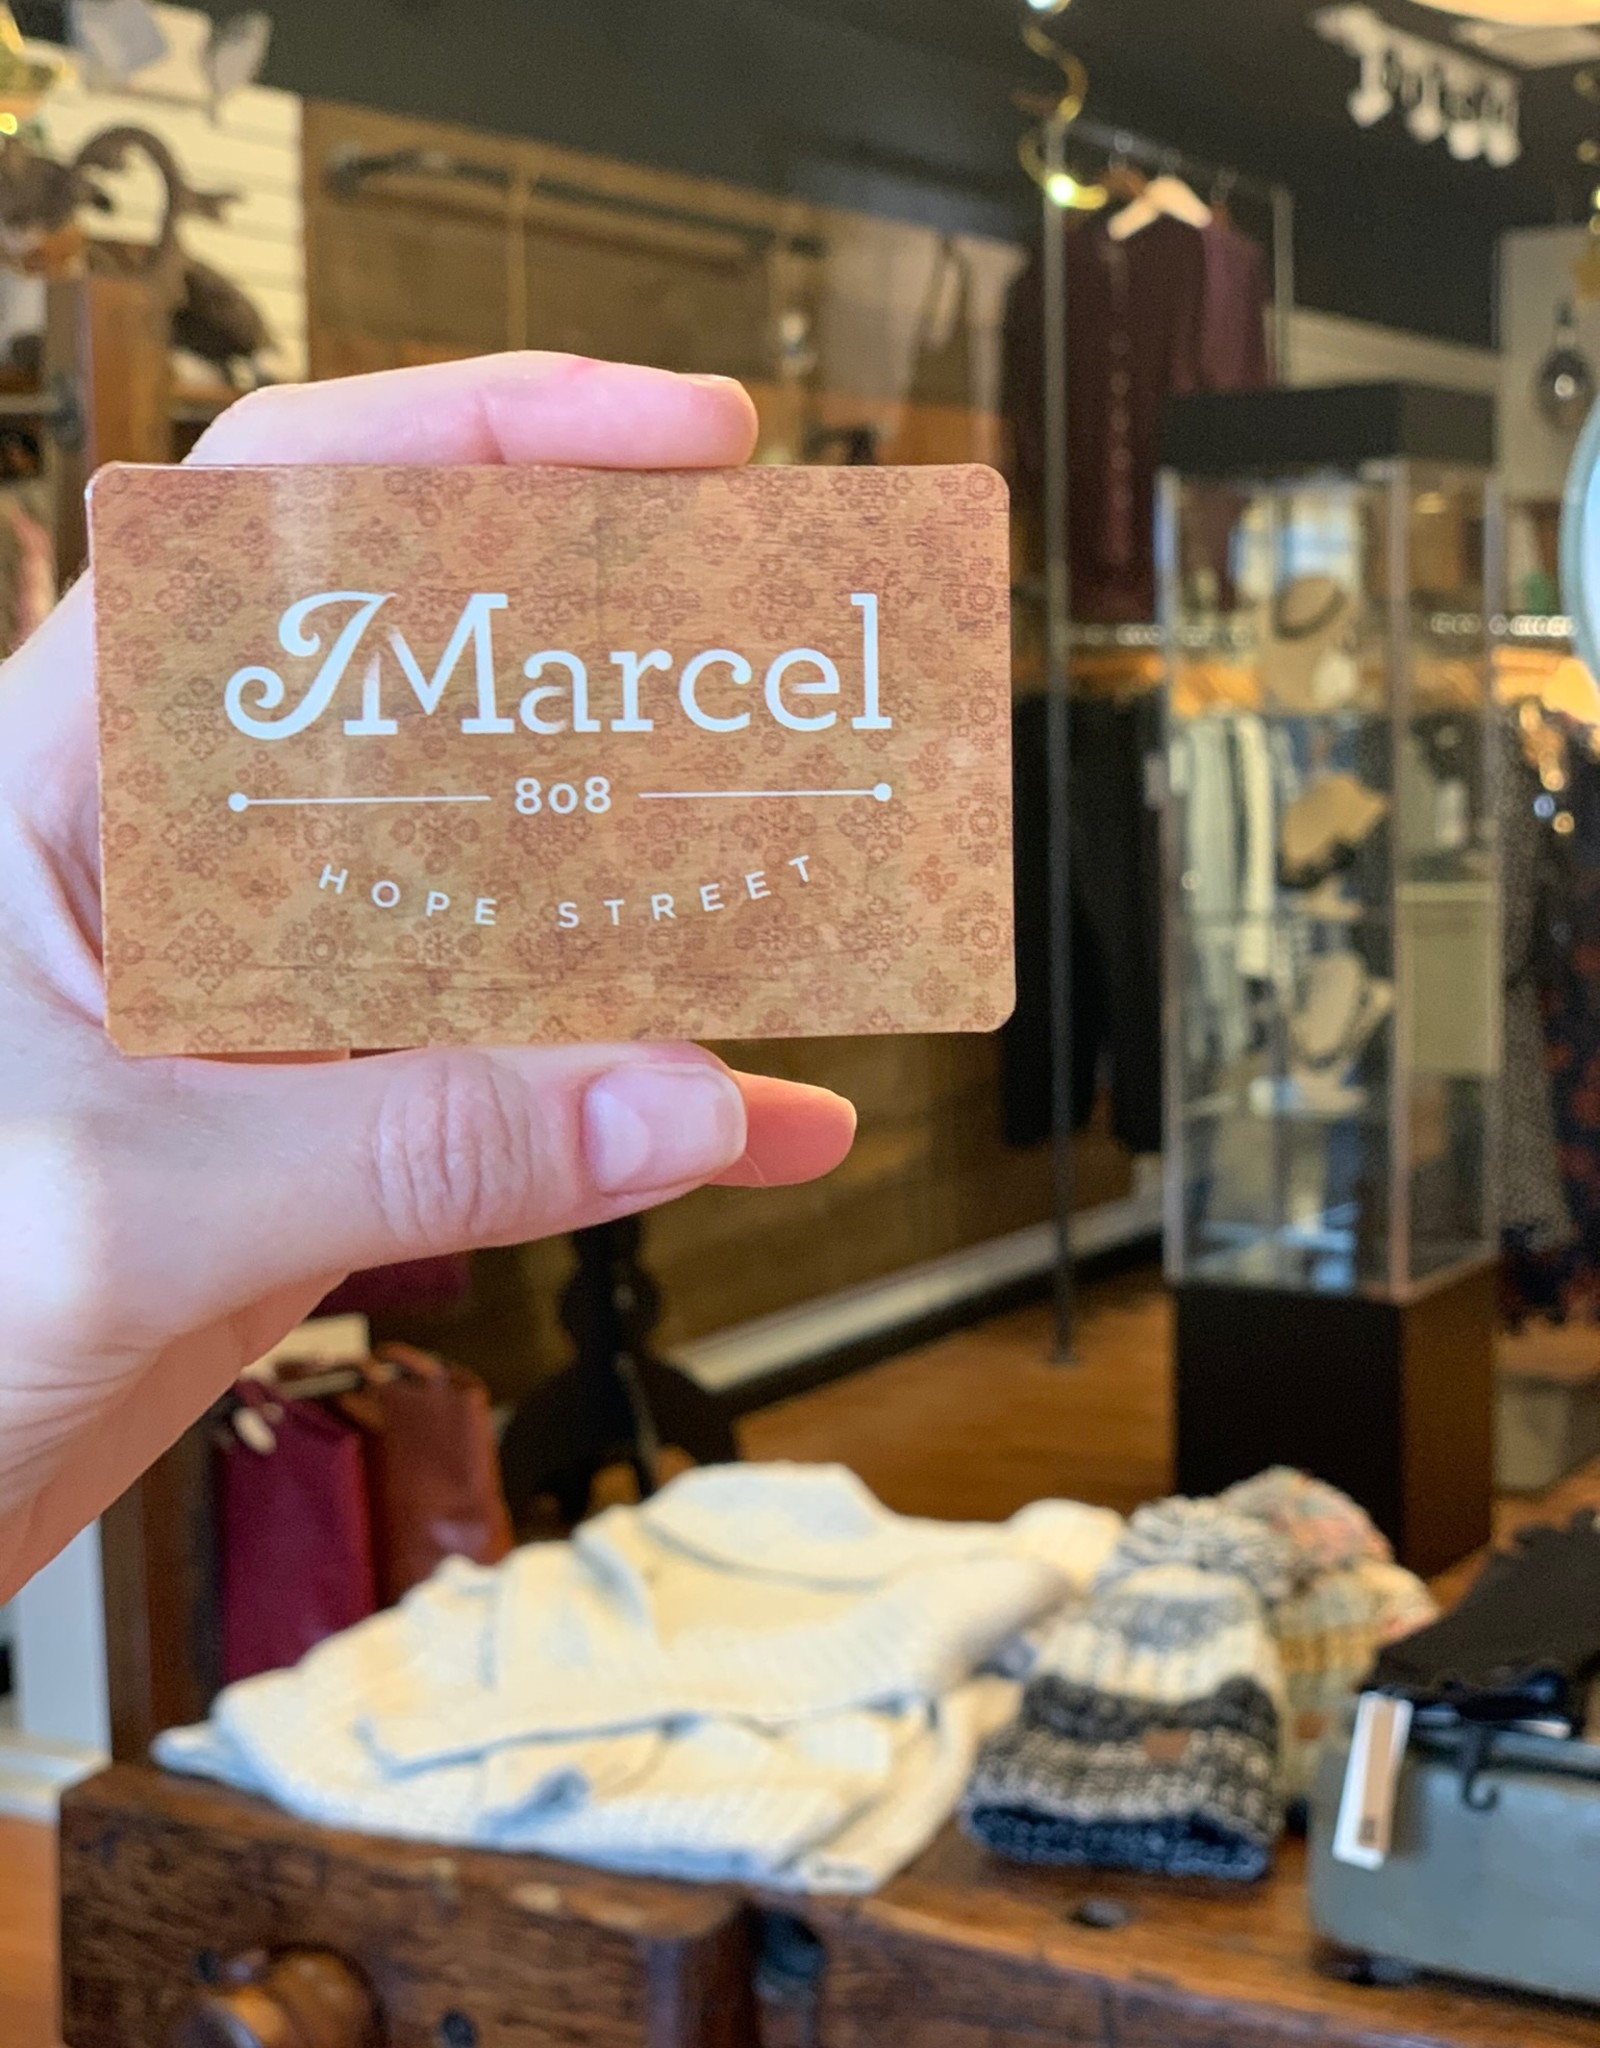 J Marcel $100 Gift Card